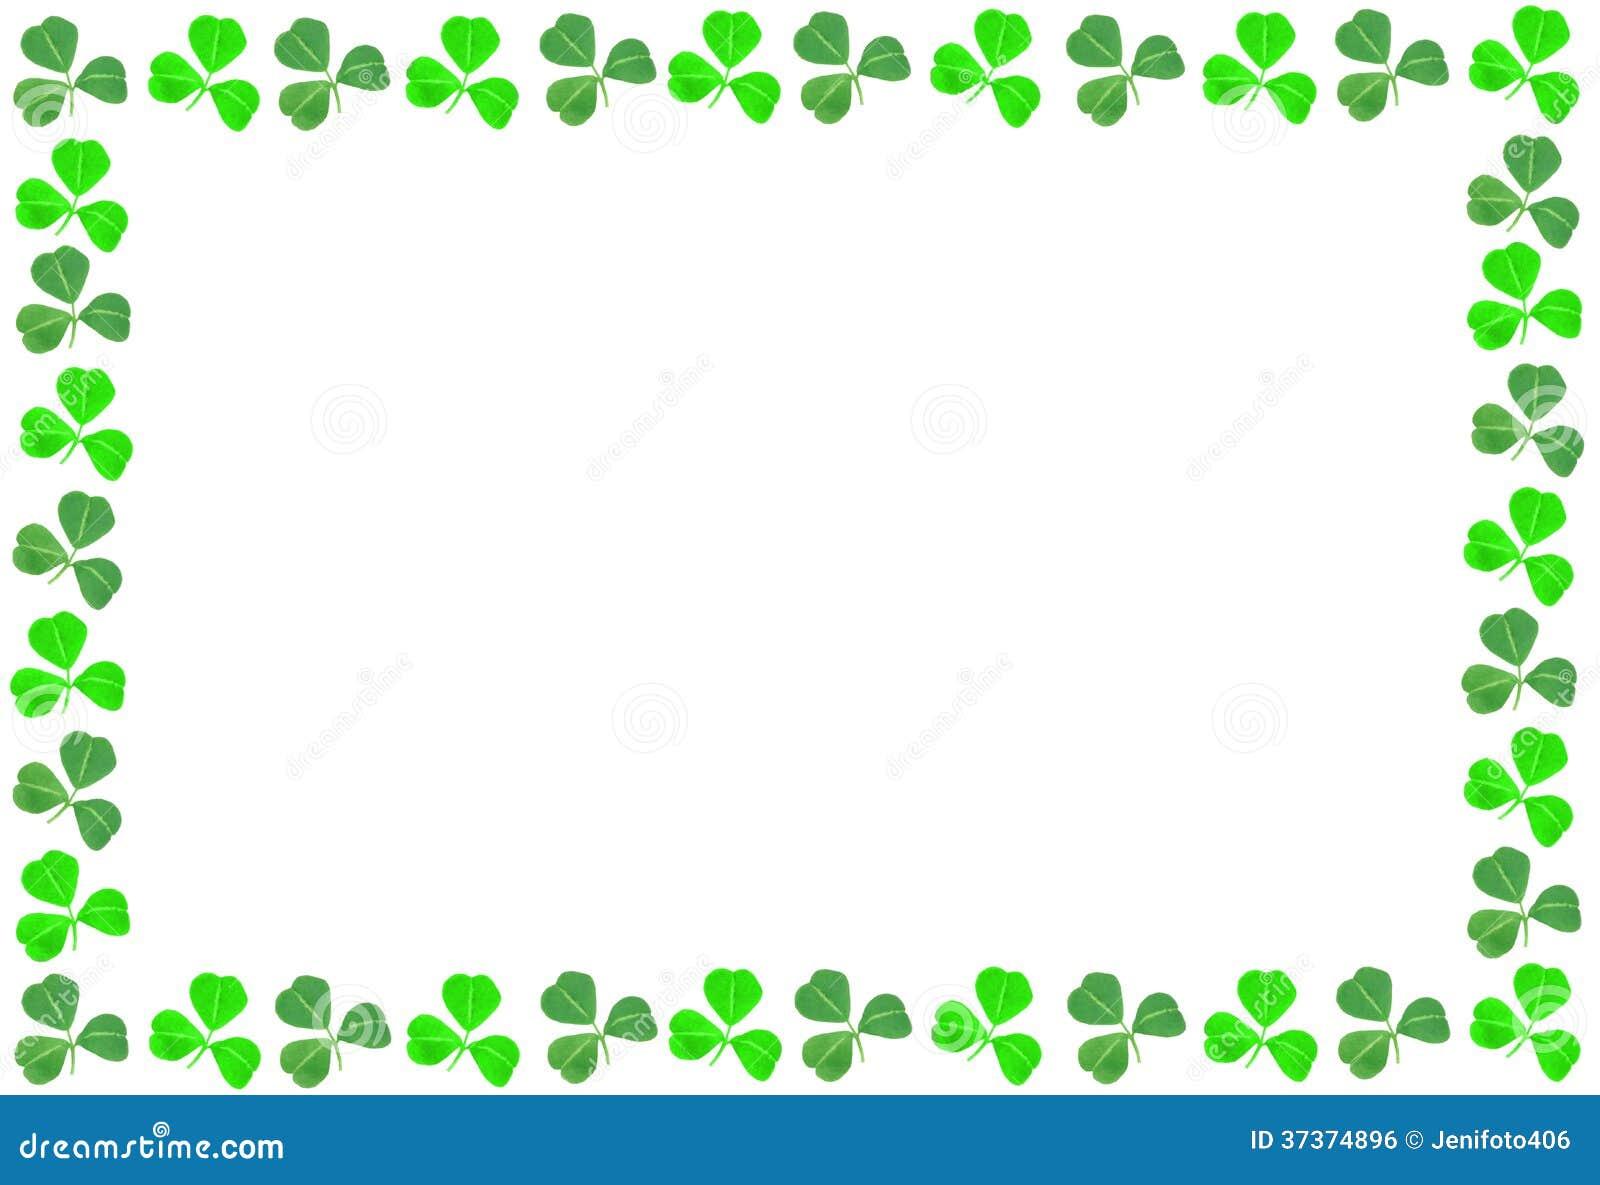 St Patricks Day Shamrock Frame Royalty Free Stock Image